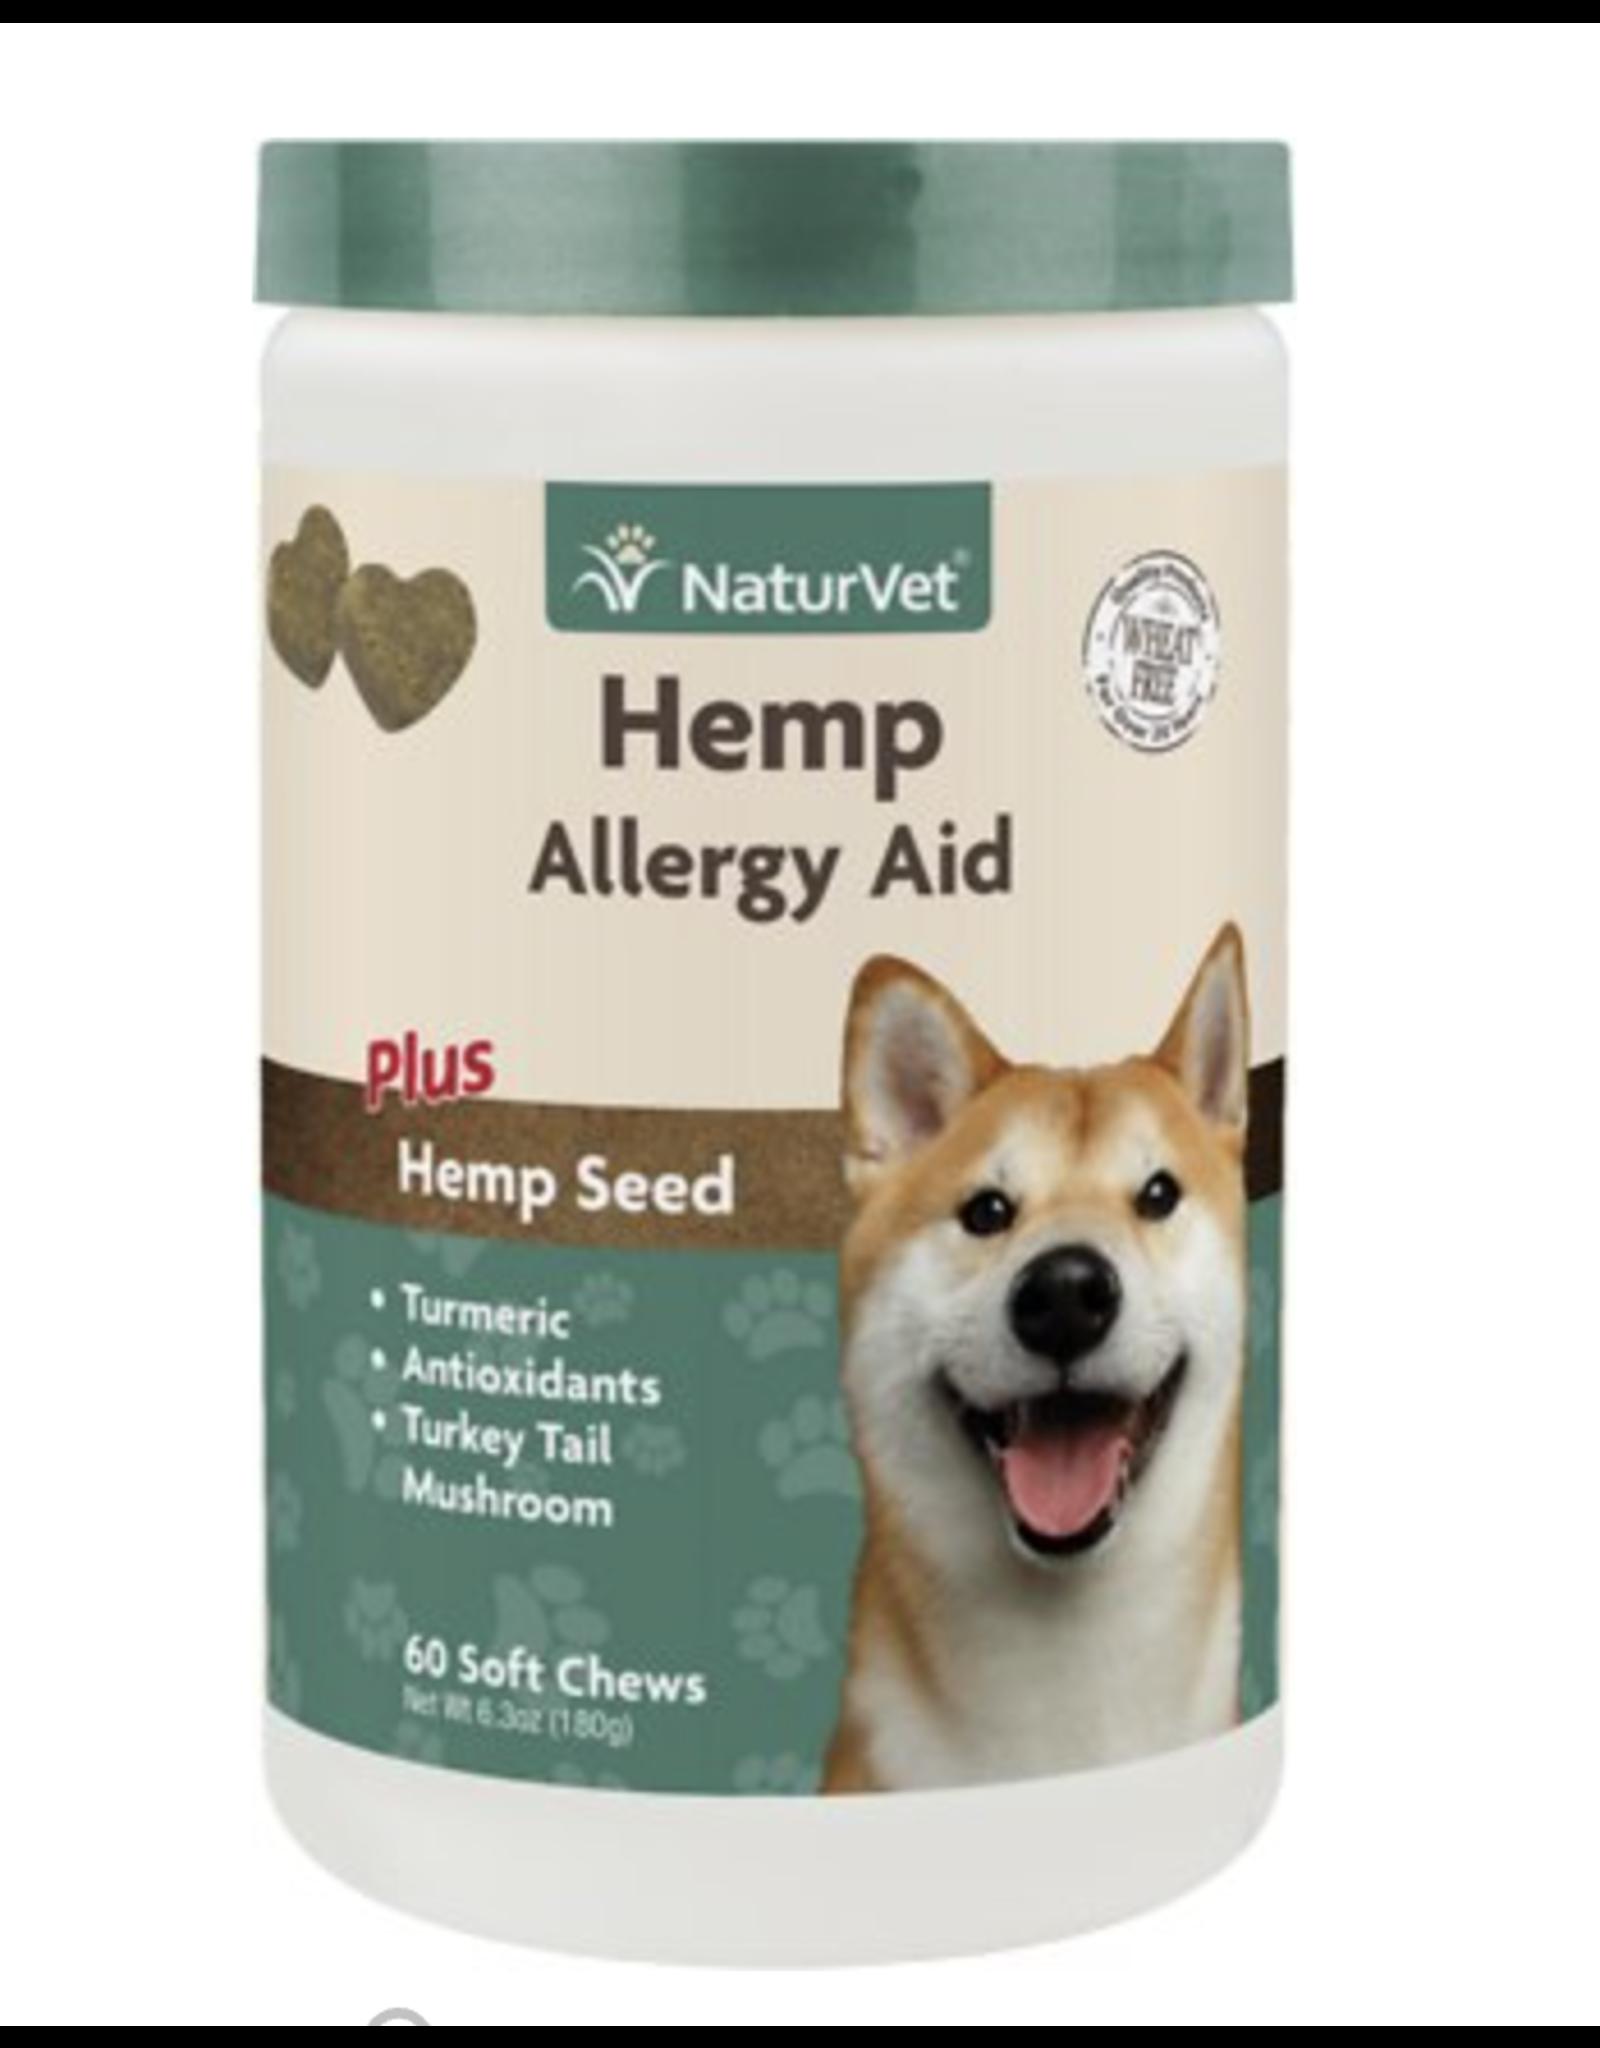 NaturVet NaturVet Hemp Allergy Aid Plus Hemp Seed Dog Soft Chews 60CT